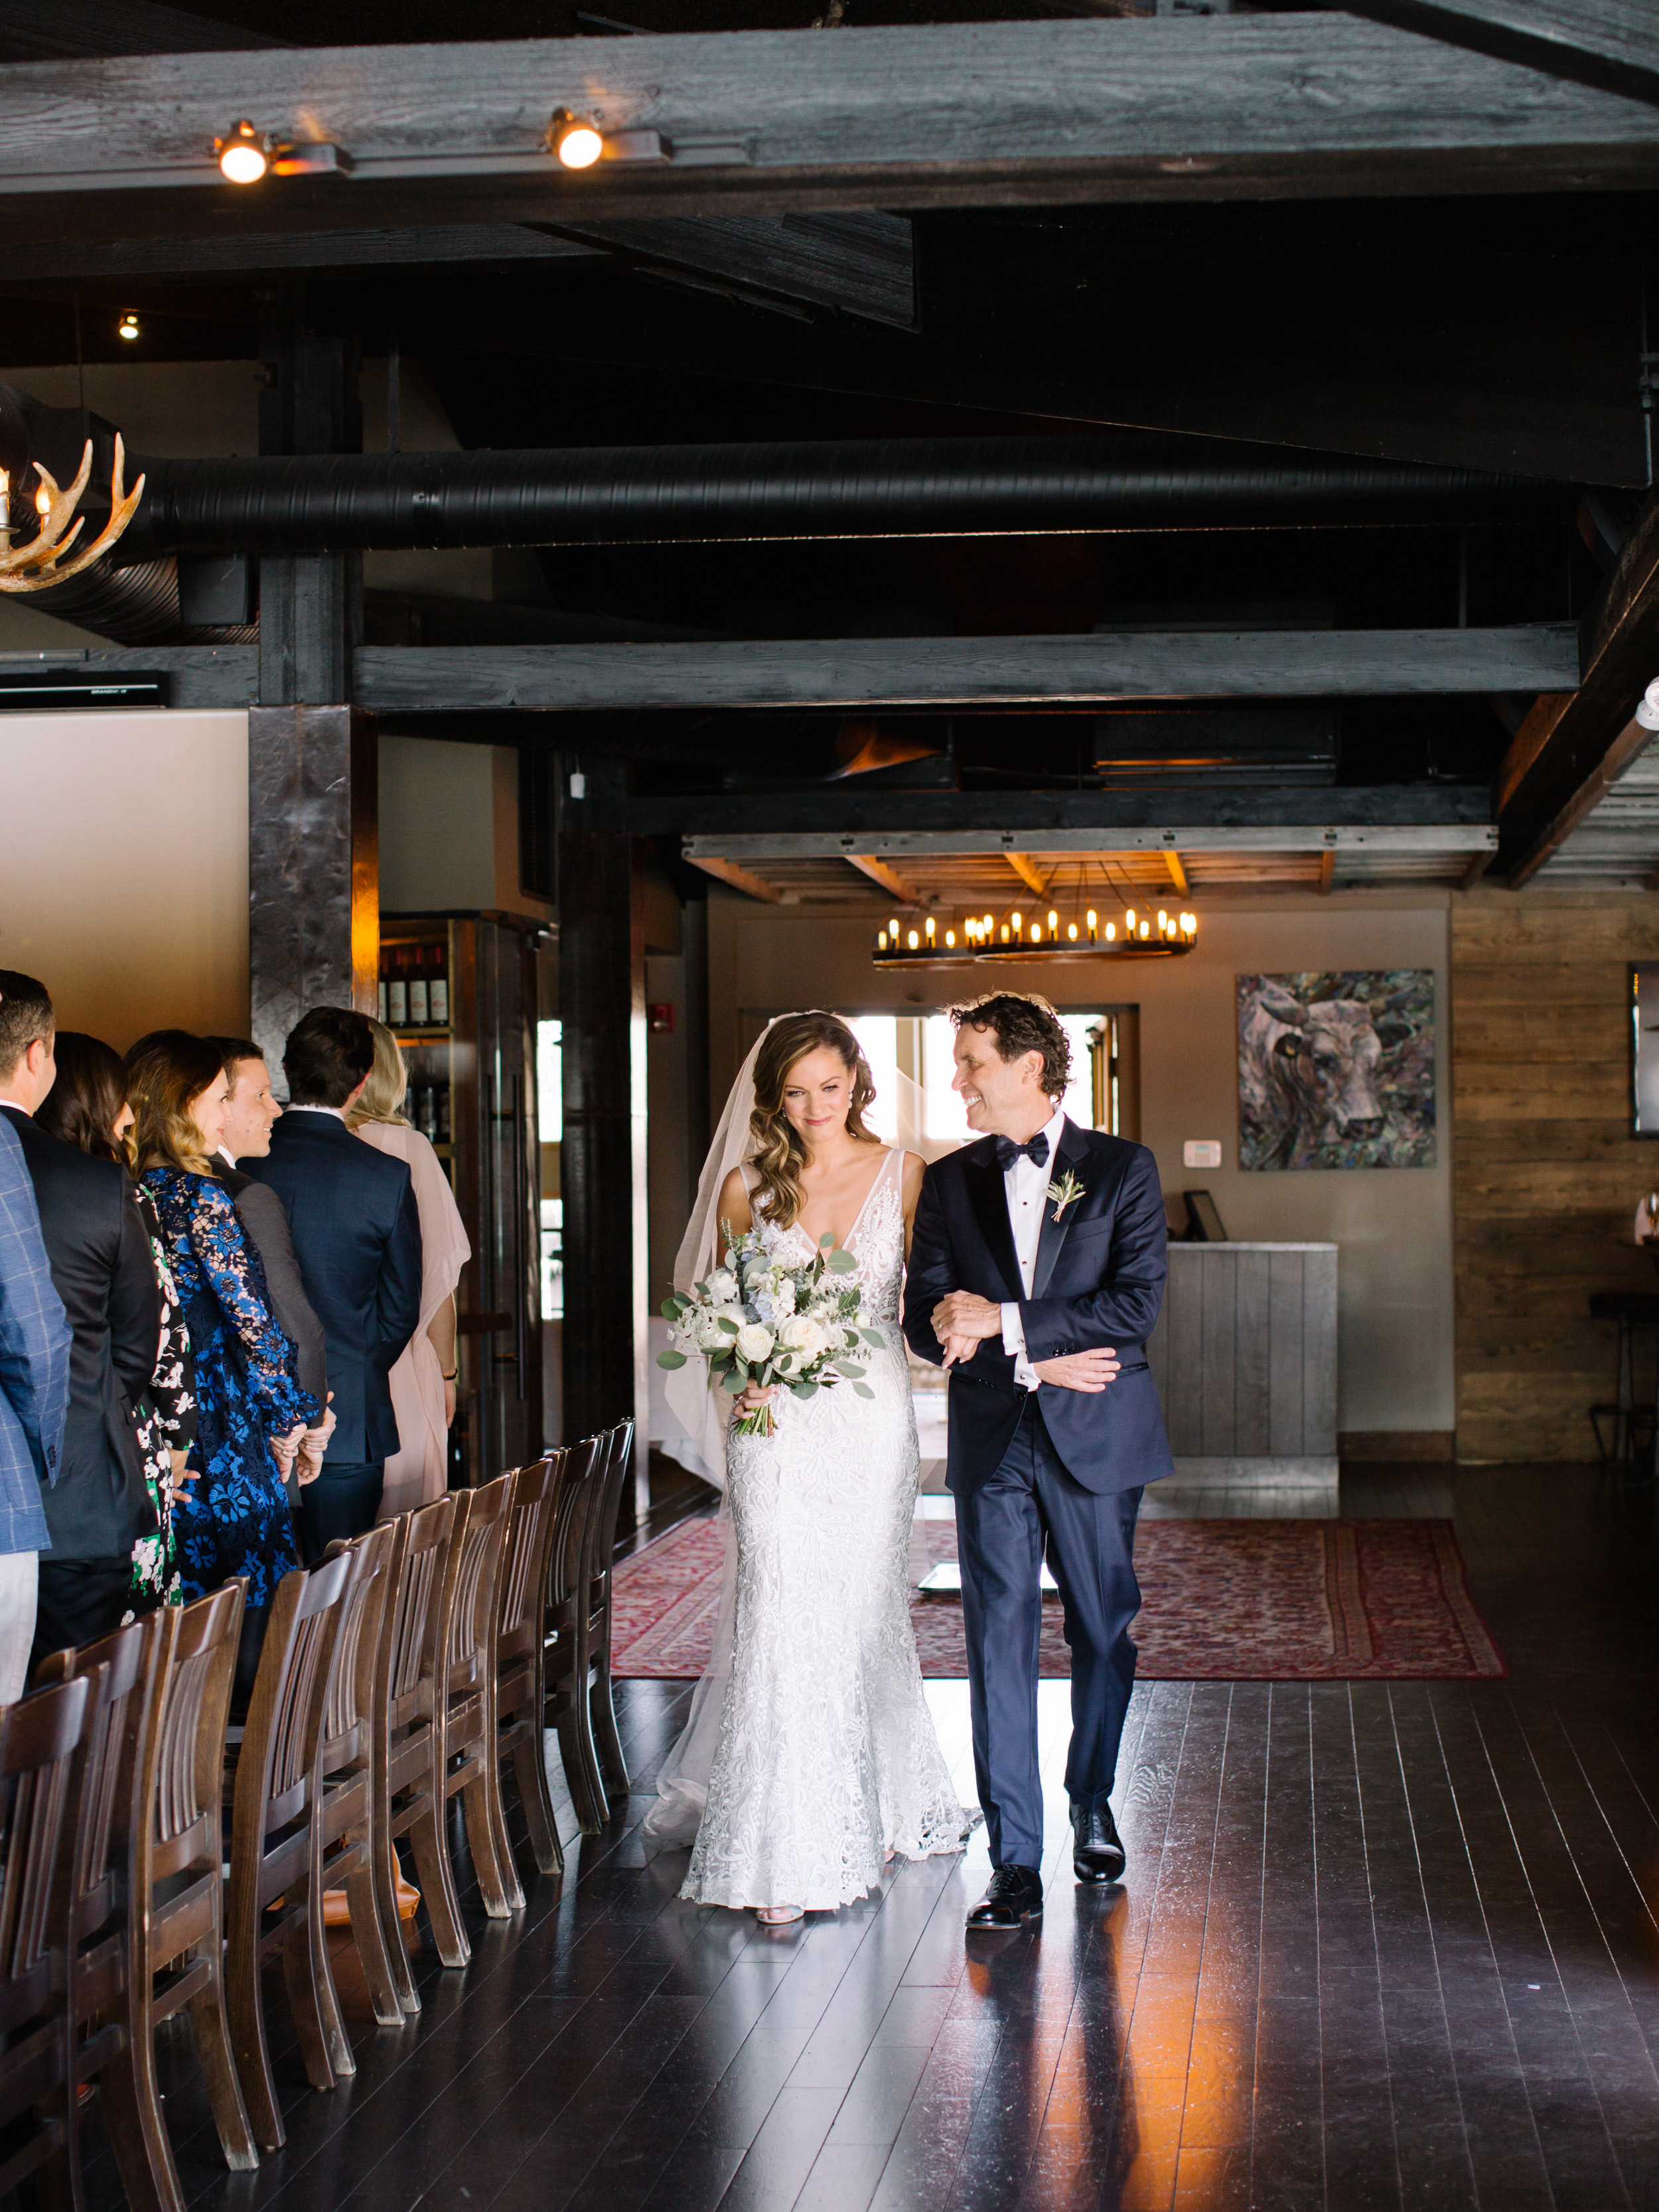 055-The_Lake_House_Calgary_Wedding.jpg